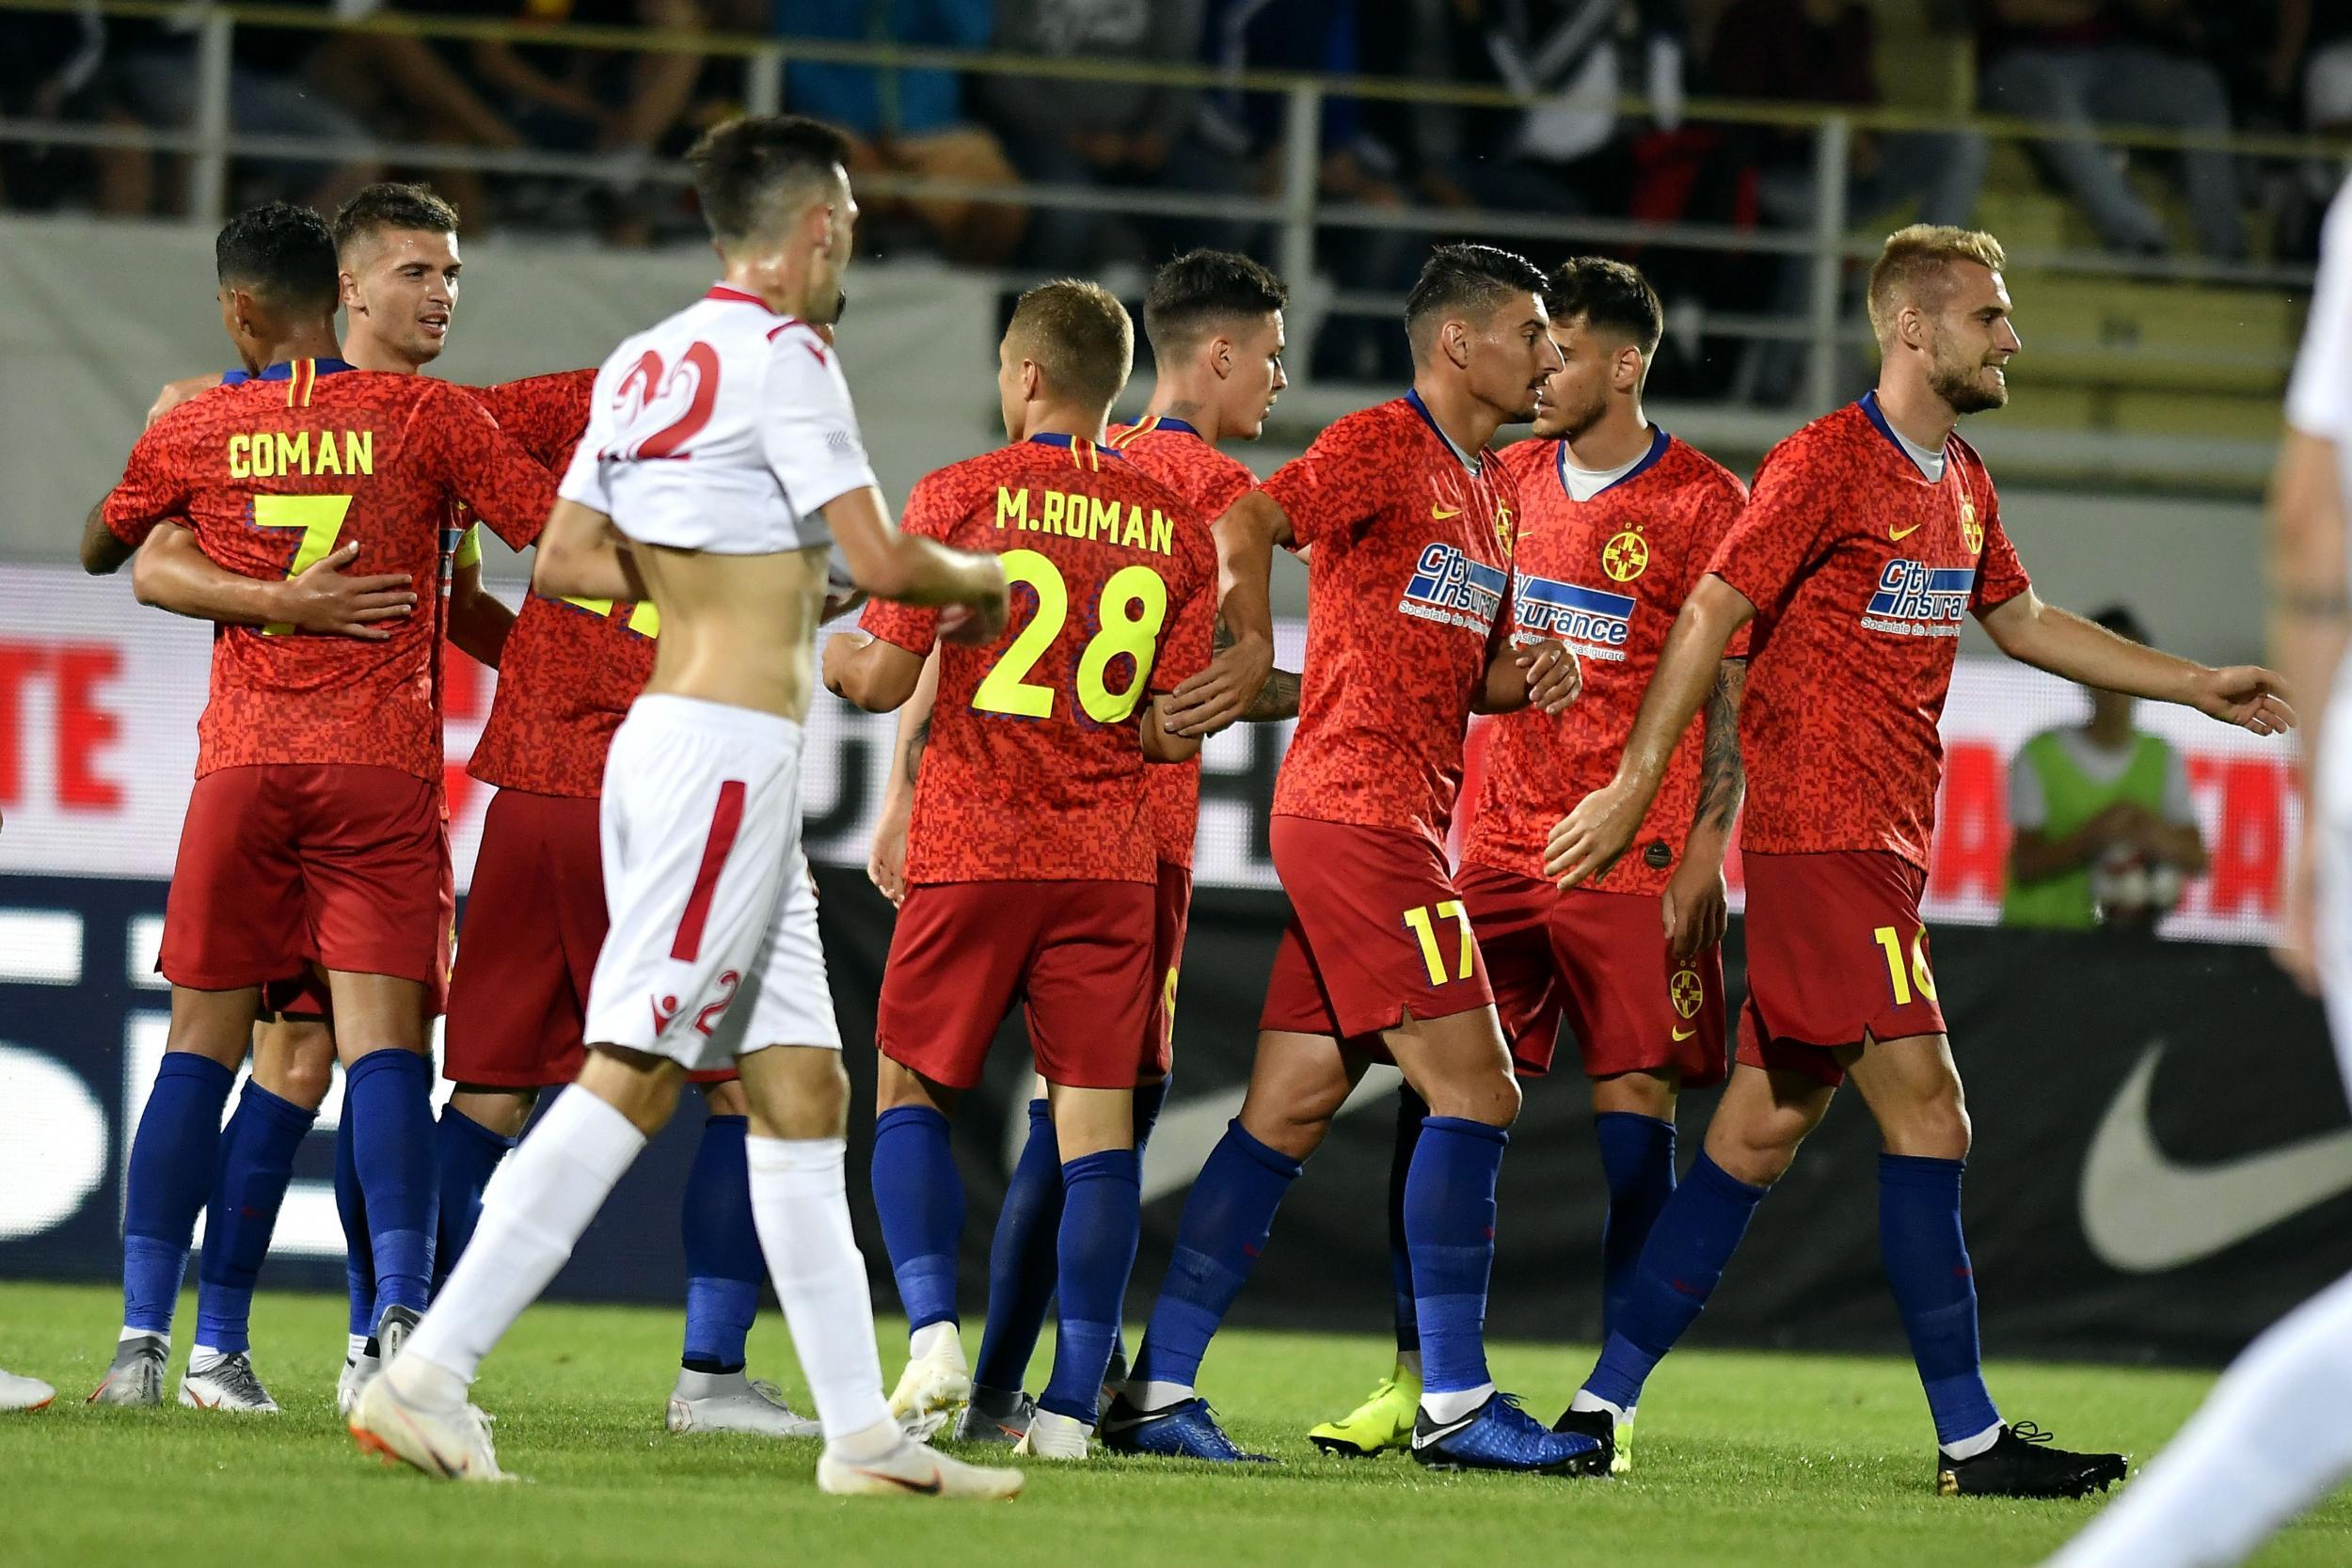 FCSB - FC MILSAMI 2-0